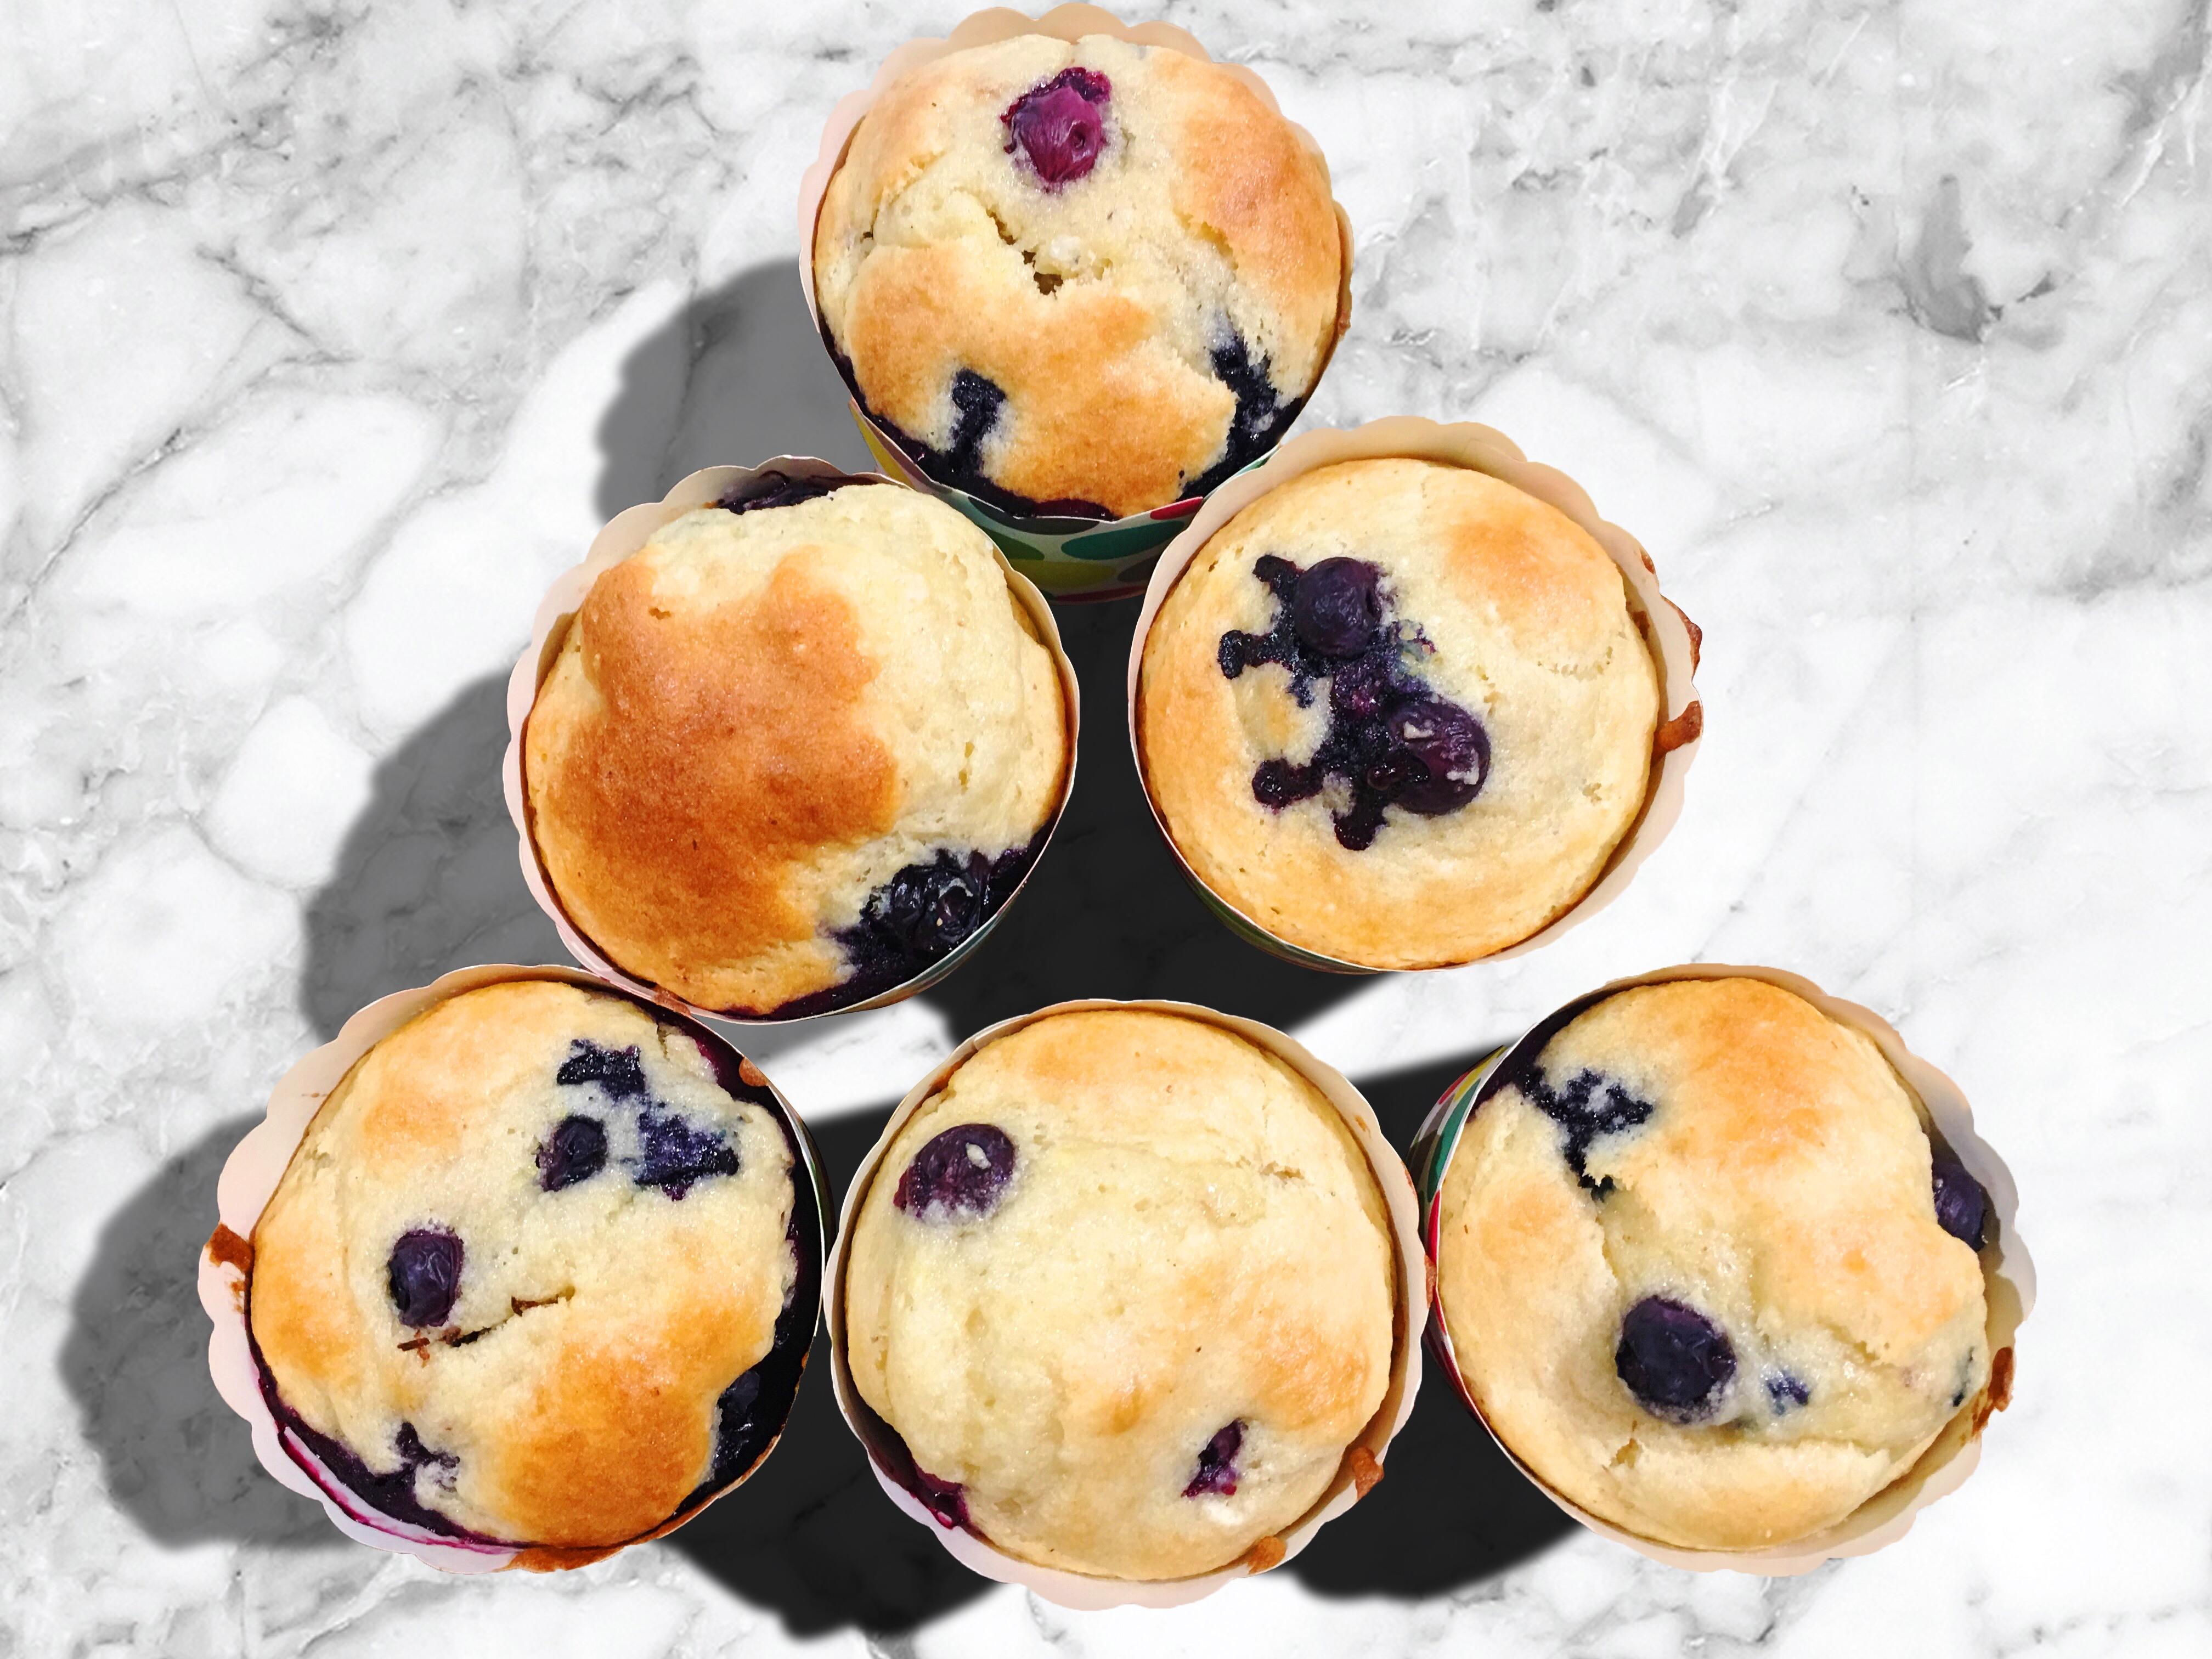 Blueberry Muffins (Paleo, Keto)